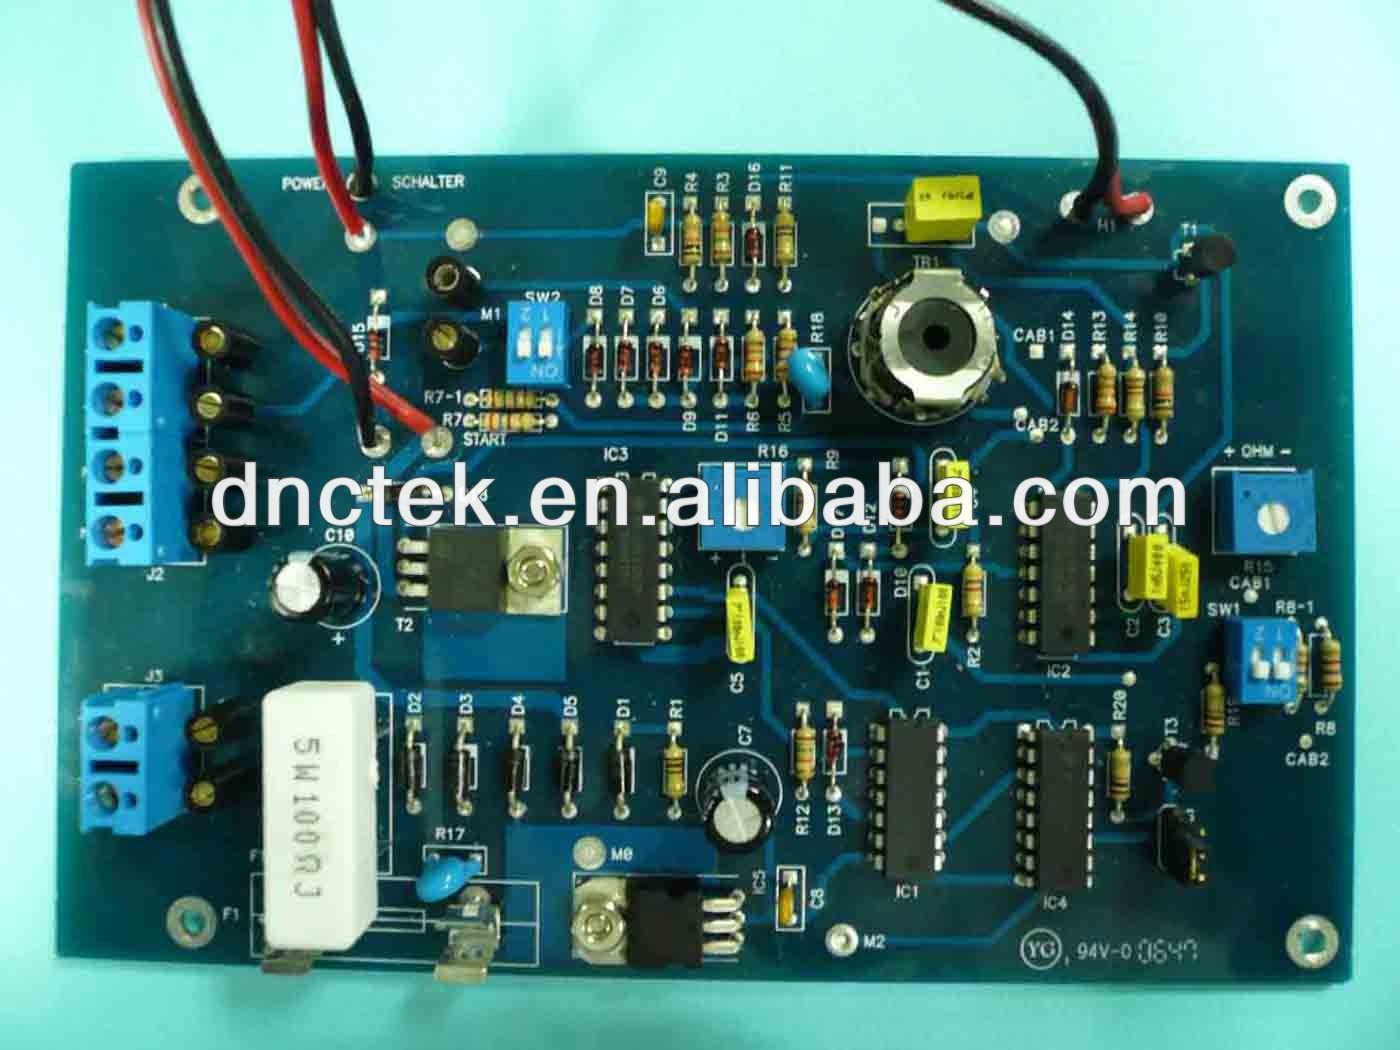 Pcb Mass Production Printed Circuit Board Pcb Mass Production Printed Circuit Board Suppliers and Manufacturers at Alibaba